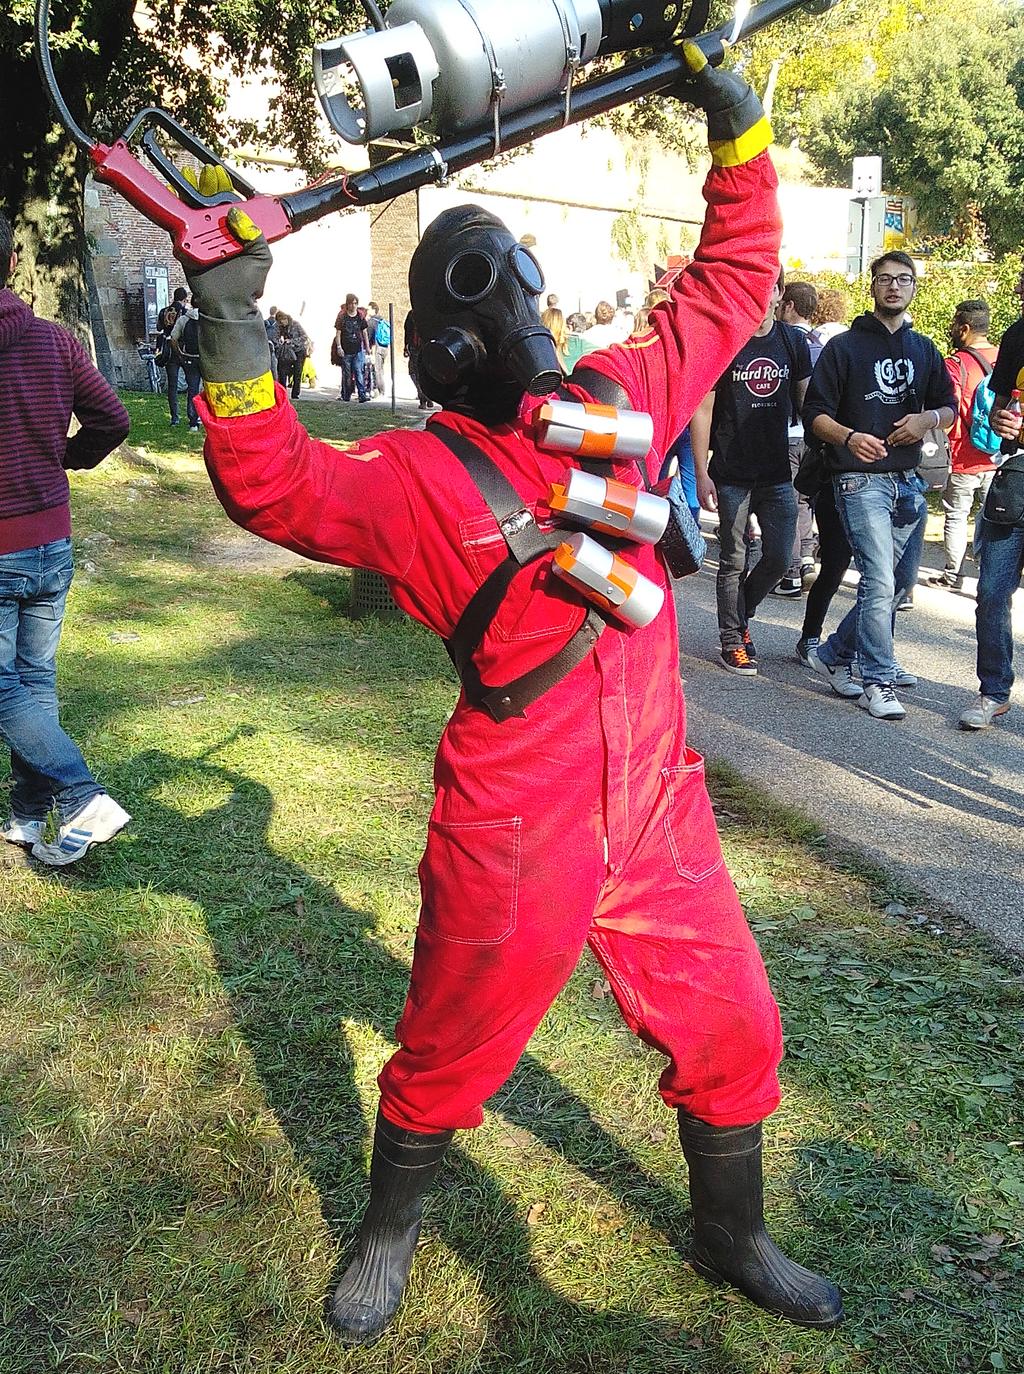 Pyro Tf2 Cosplay TF2 cosplay - The Pyro...